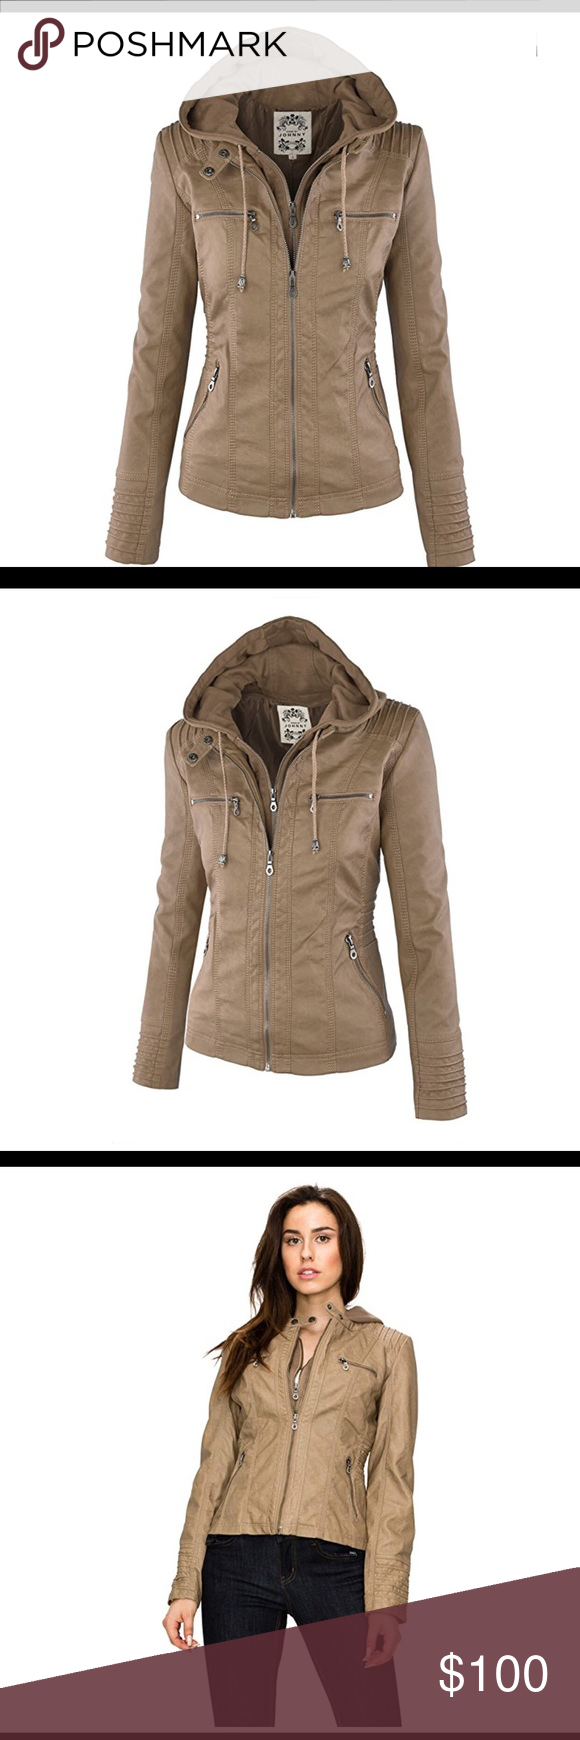 0690 Women's Hooded Faux Leather Jacket Hooded faux